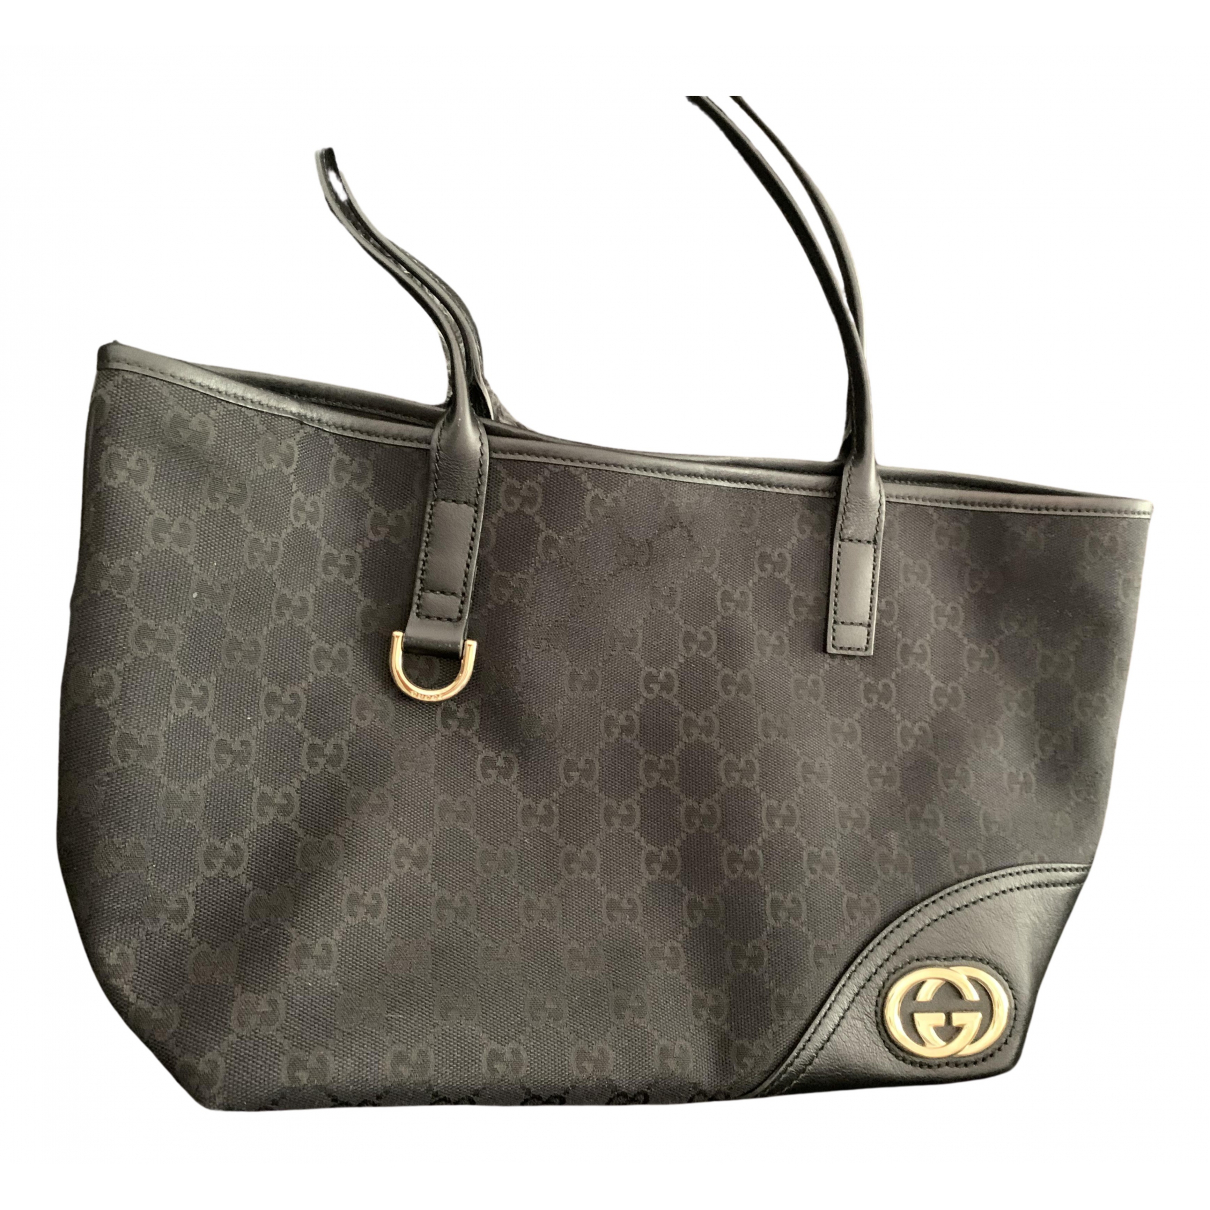 Gucci N Black Cloth handbag for Women N